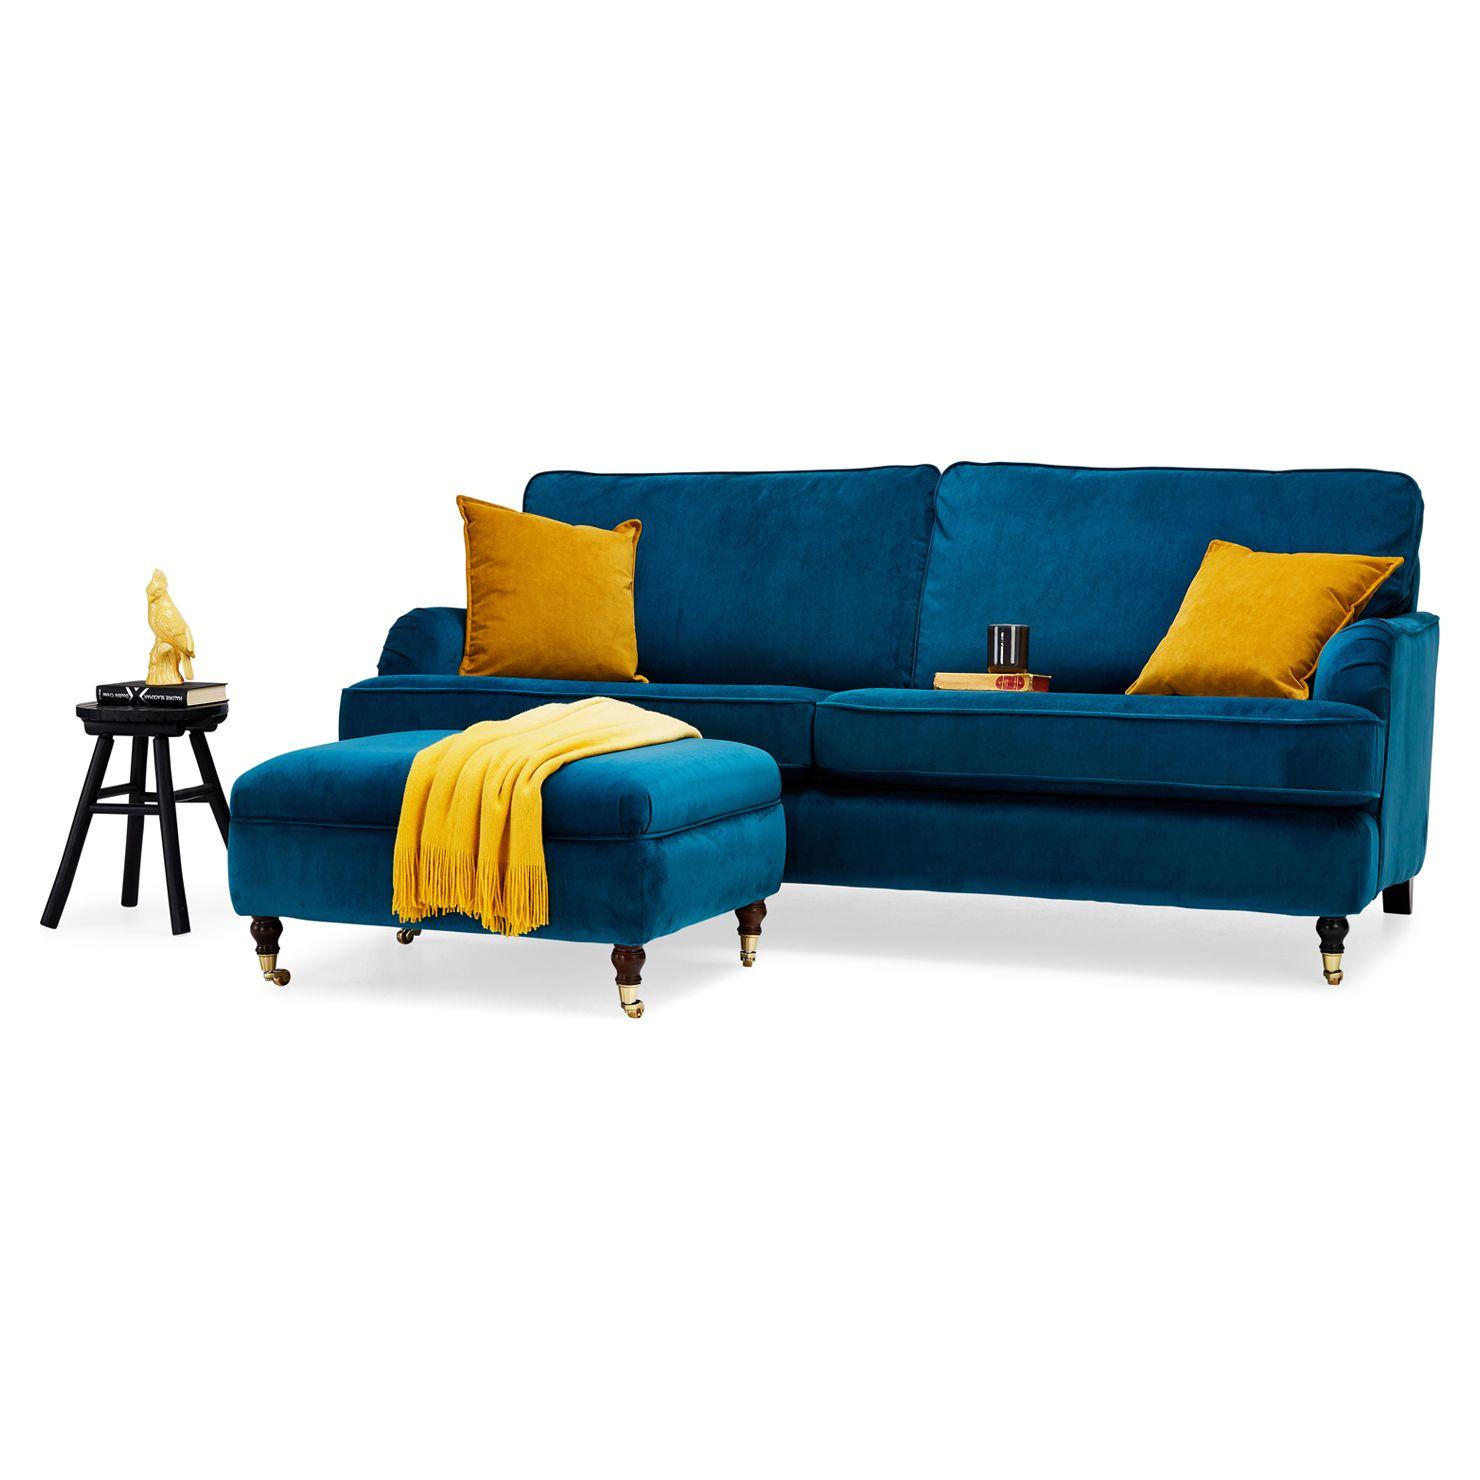 Richmond 3 Seater Sofa, Teal | Teal sofa, 3 seater sofa, Sofa